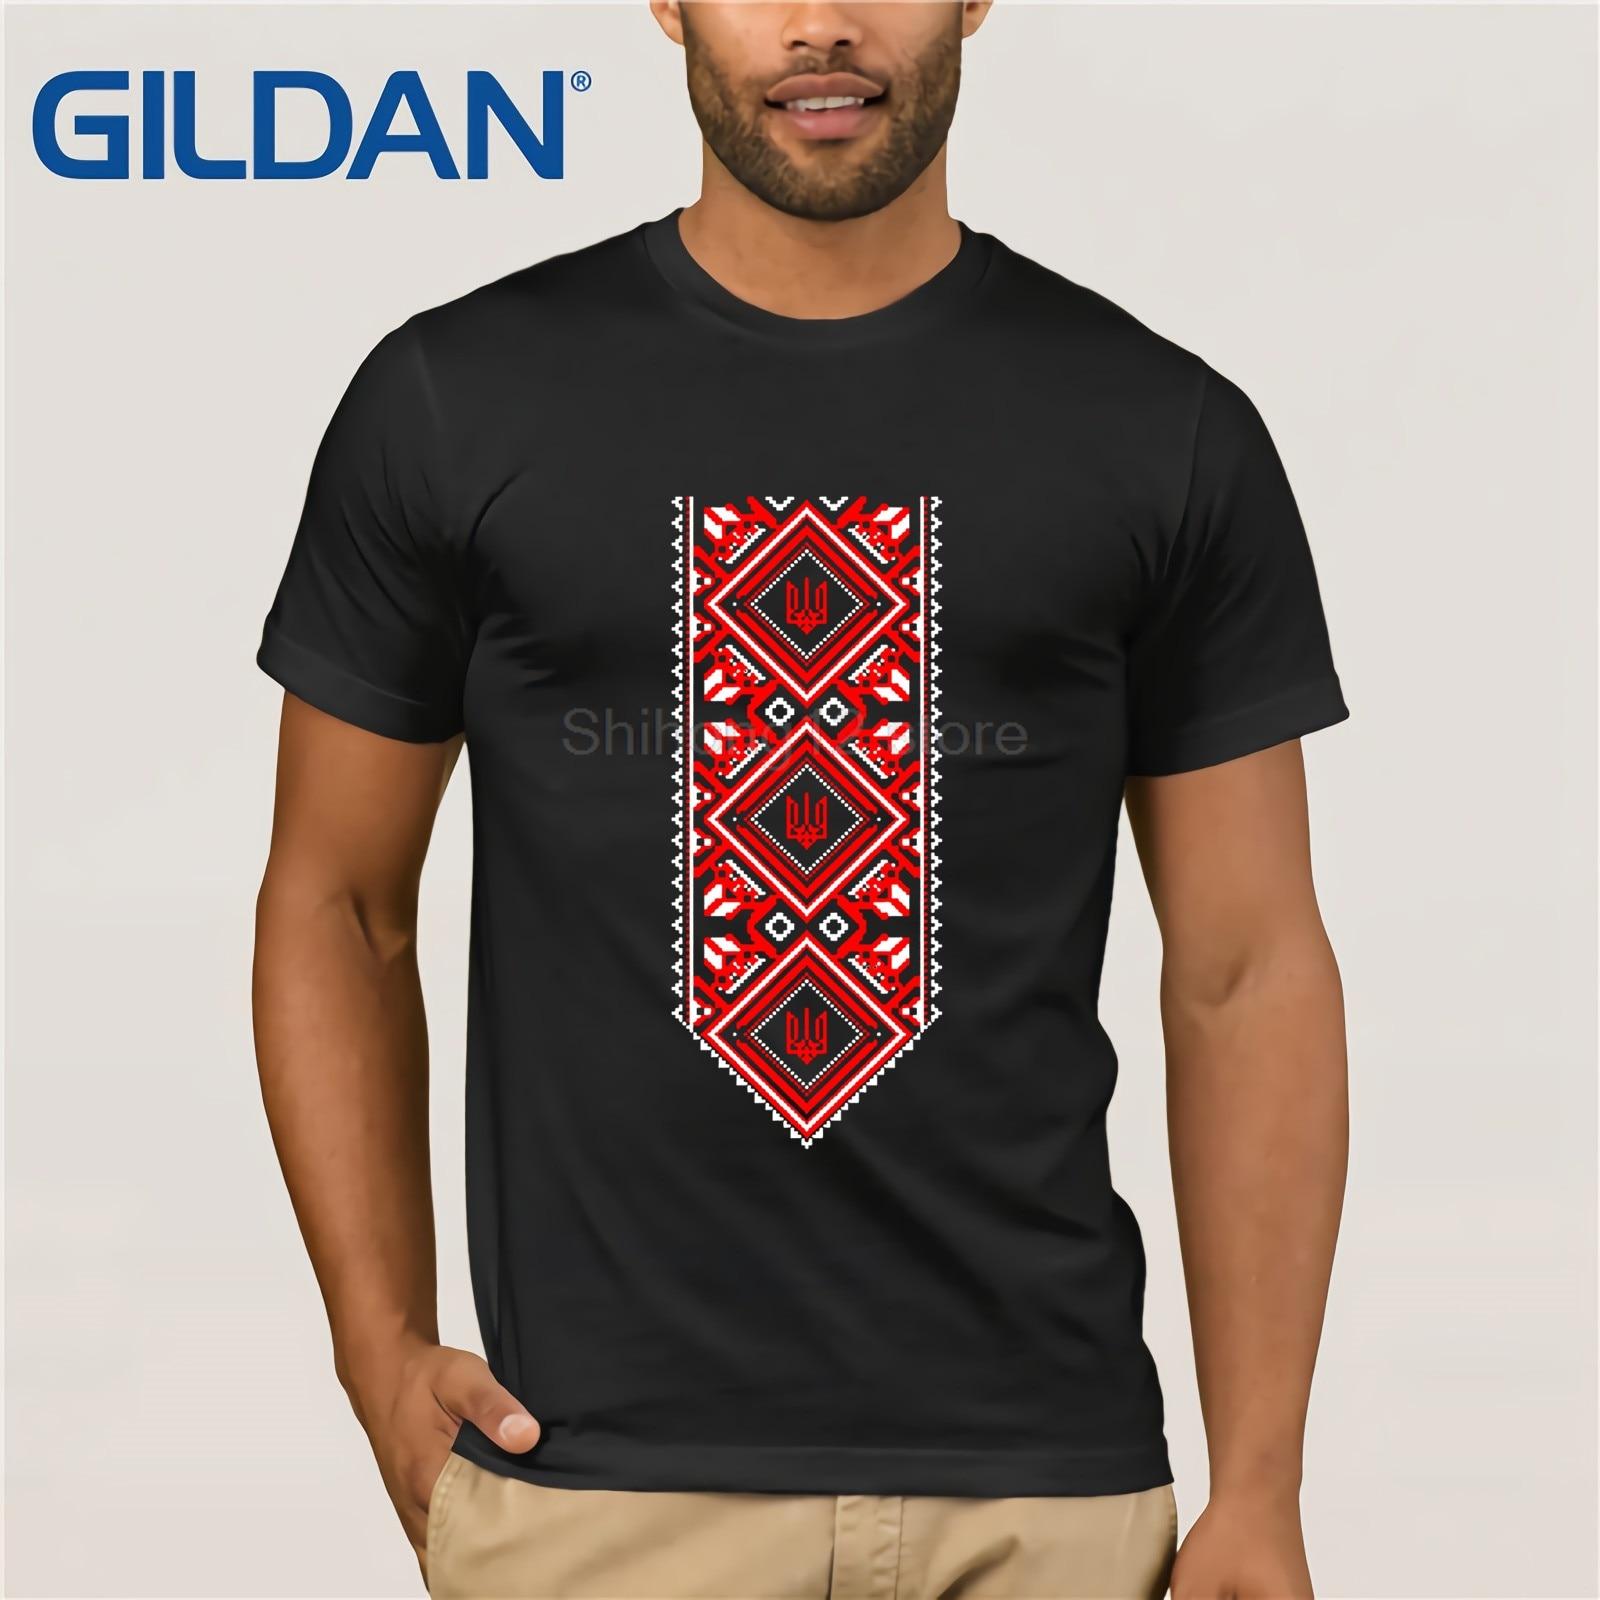 7bbbf3c8f87 Detail Feedback Questions about Gildan t shirt 2019 Fashion men t shirt  gildan Ukrainian Embroidered Print Vyshyvanka T Shirt of Ukraine on  Aliexpress.com ...